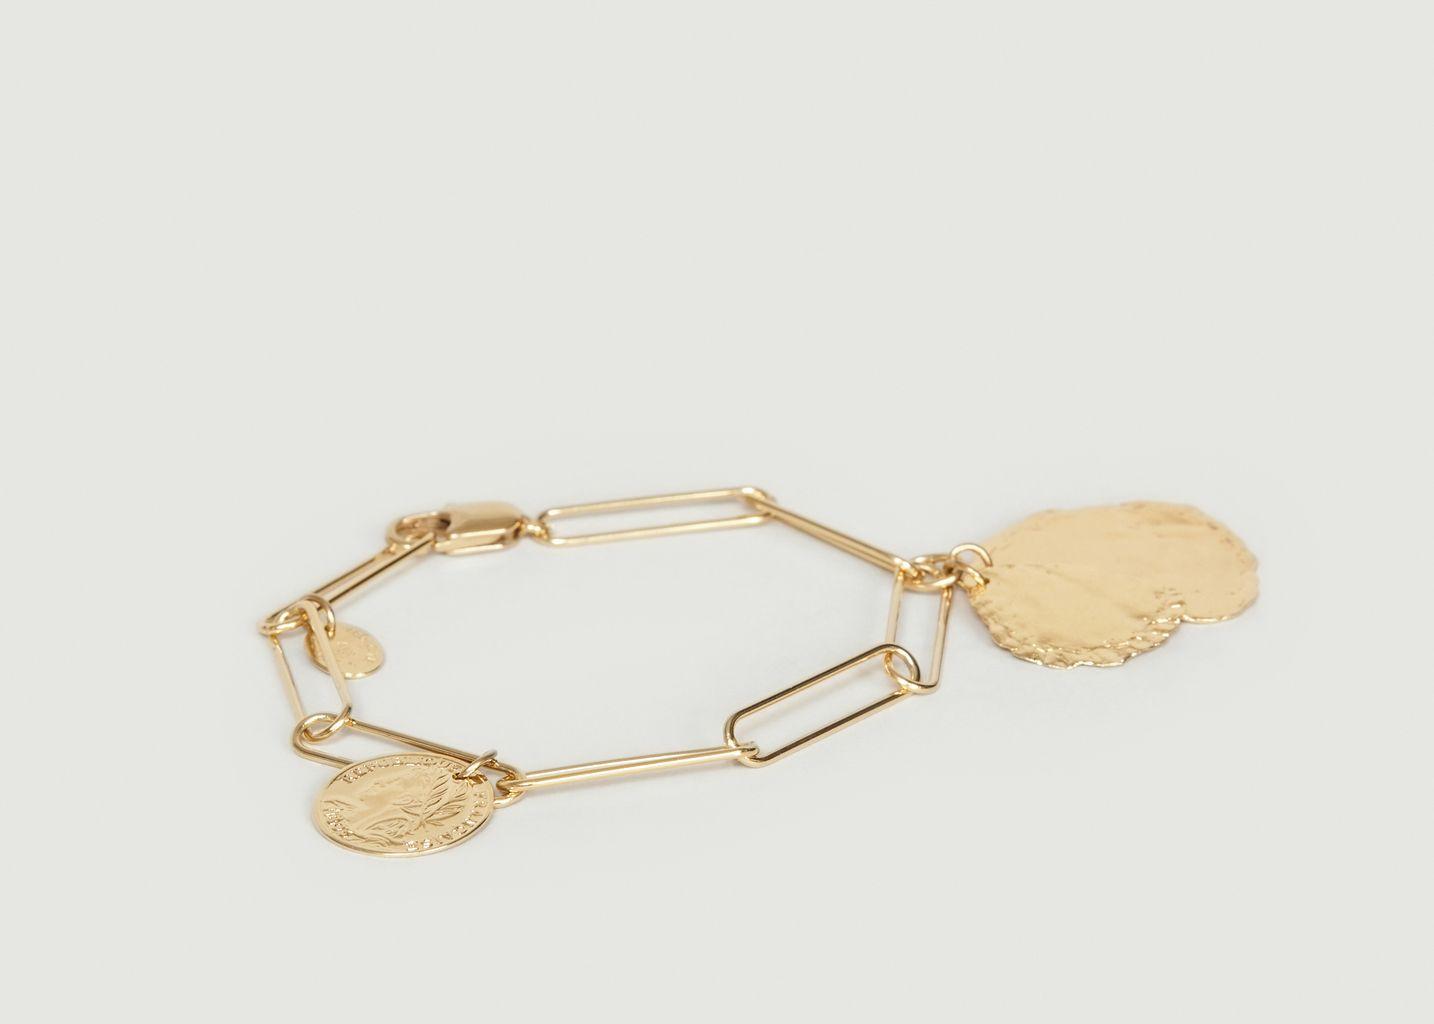 Bracelet Tancrède - Medecine Douce